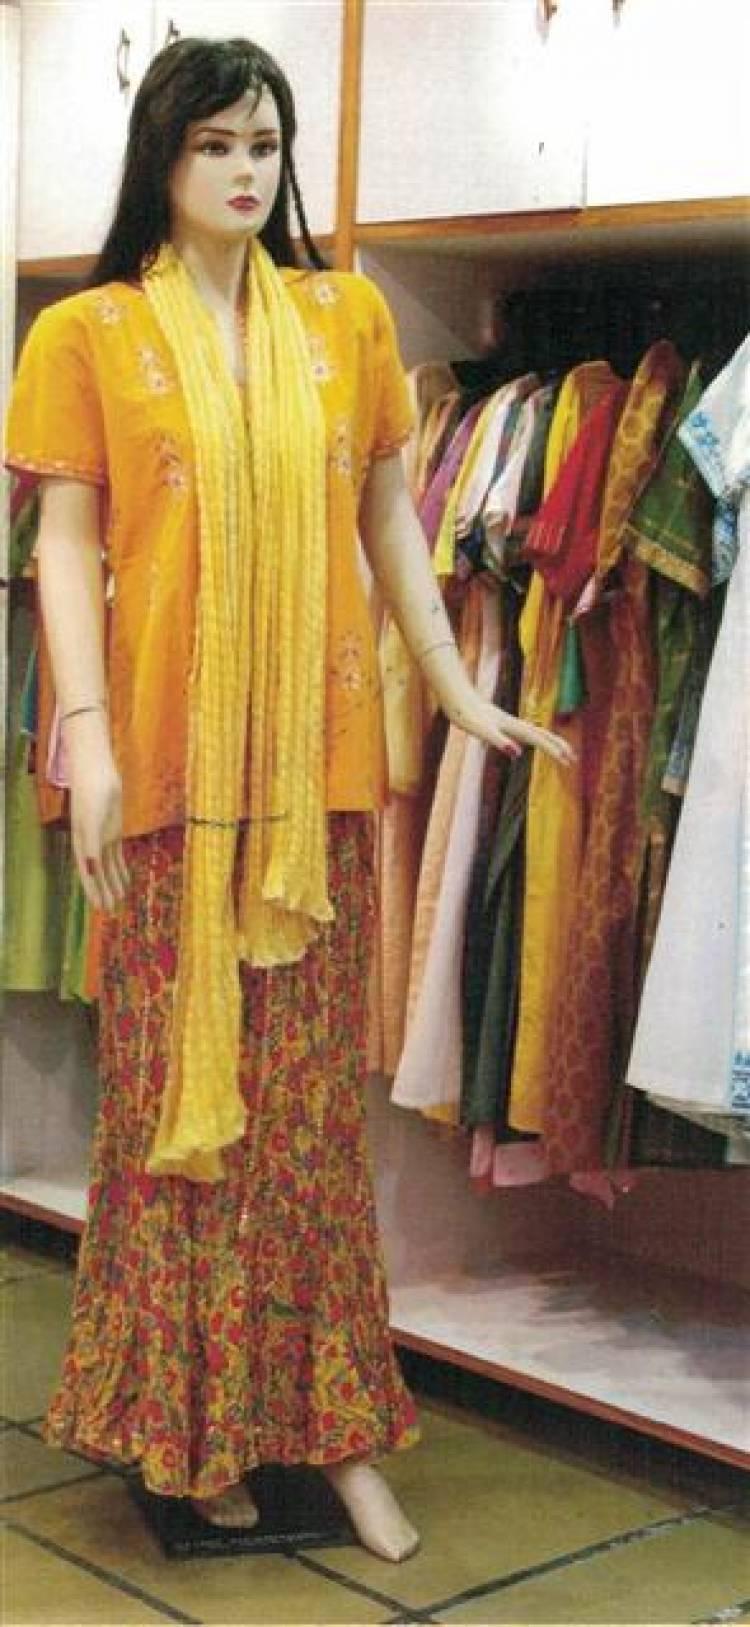 Crafts and Weaves Exhibition cum Sale of Exclusive Handicraft & Handlooms